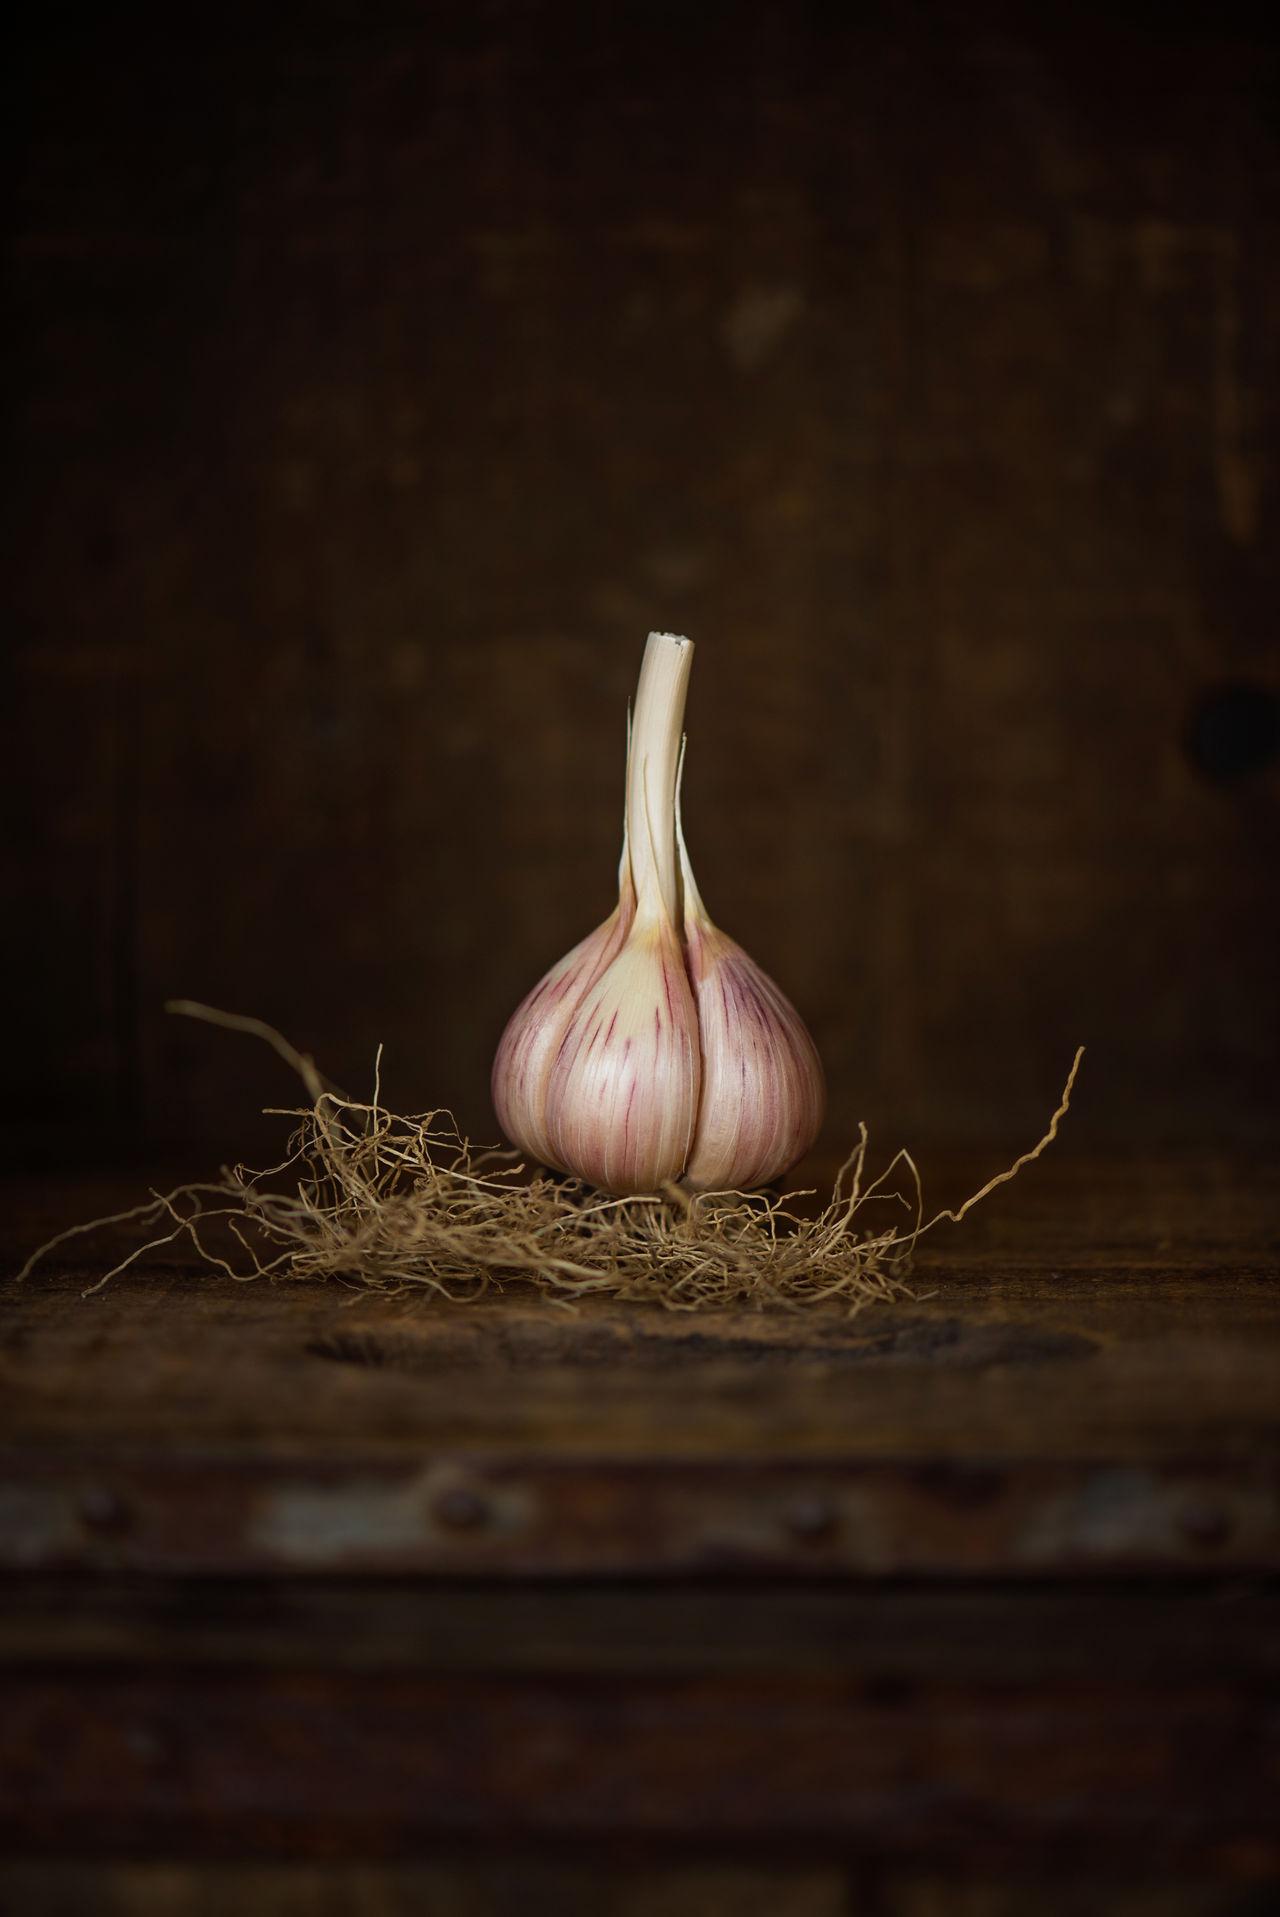 Beautiful portrait of garlic with a dark wood background Cooking EyeEm Best Shots Food Foodie Culture Garlic Garlic Bulb Garlic Bulbs Garlic Clove Healthy Eating Portrait Of Garlic Spice Still Life Studio Shot Wood - Material